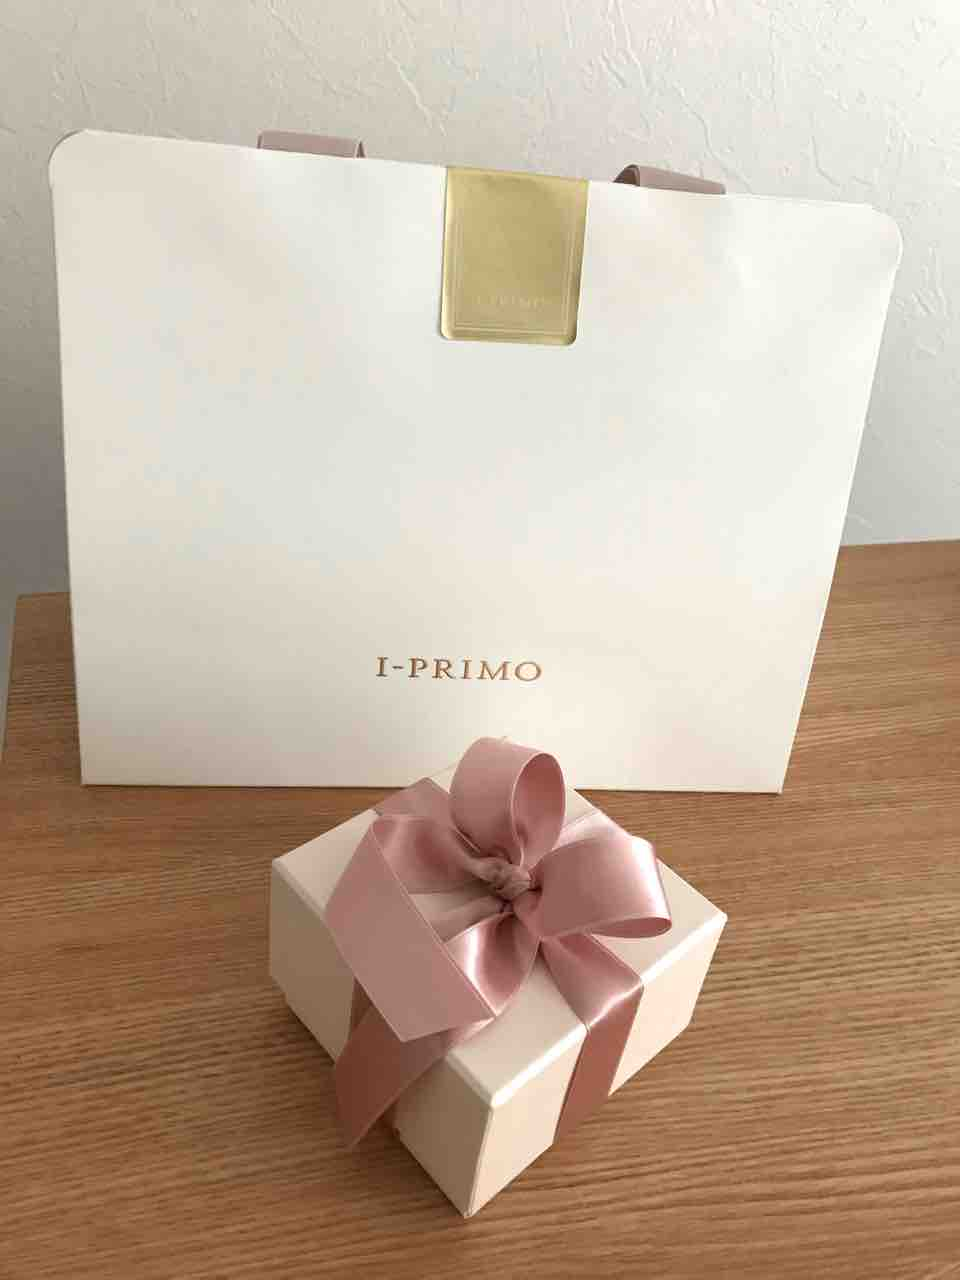 I-PRIMO(アイプリモ)の結婚指輪ケースと袋